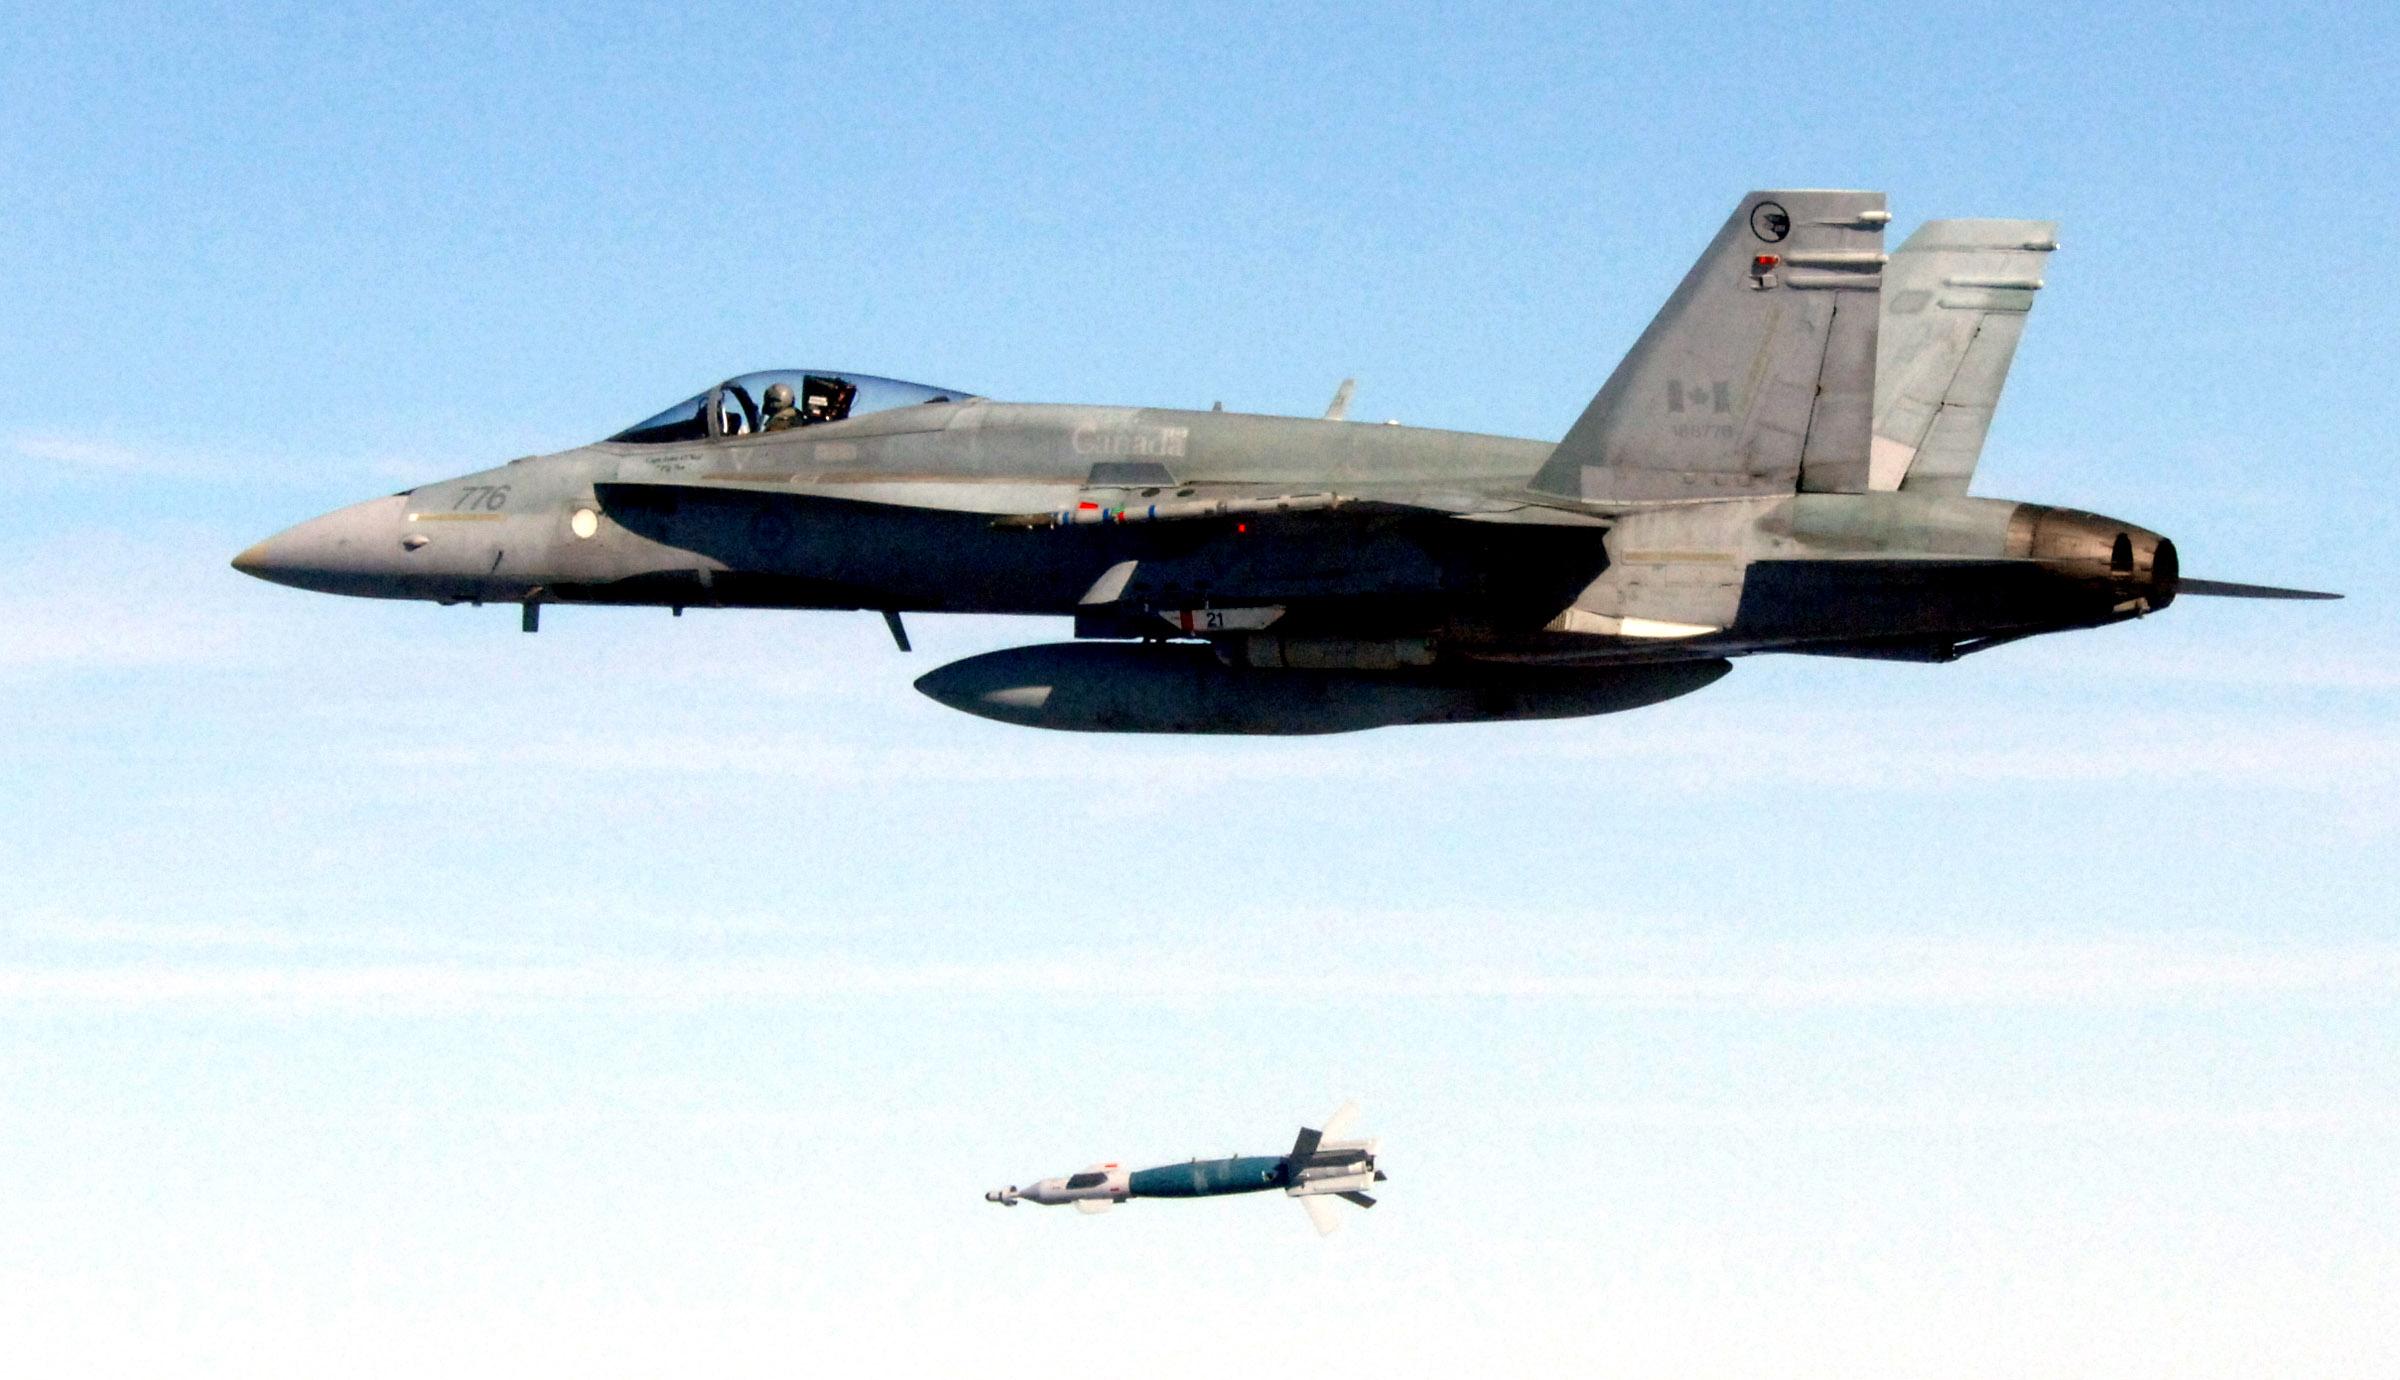 Combat Hammer Tests Air To Ground Bombing Capabilities Gt U